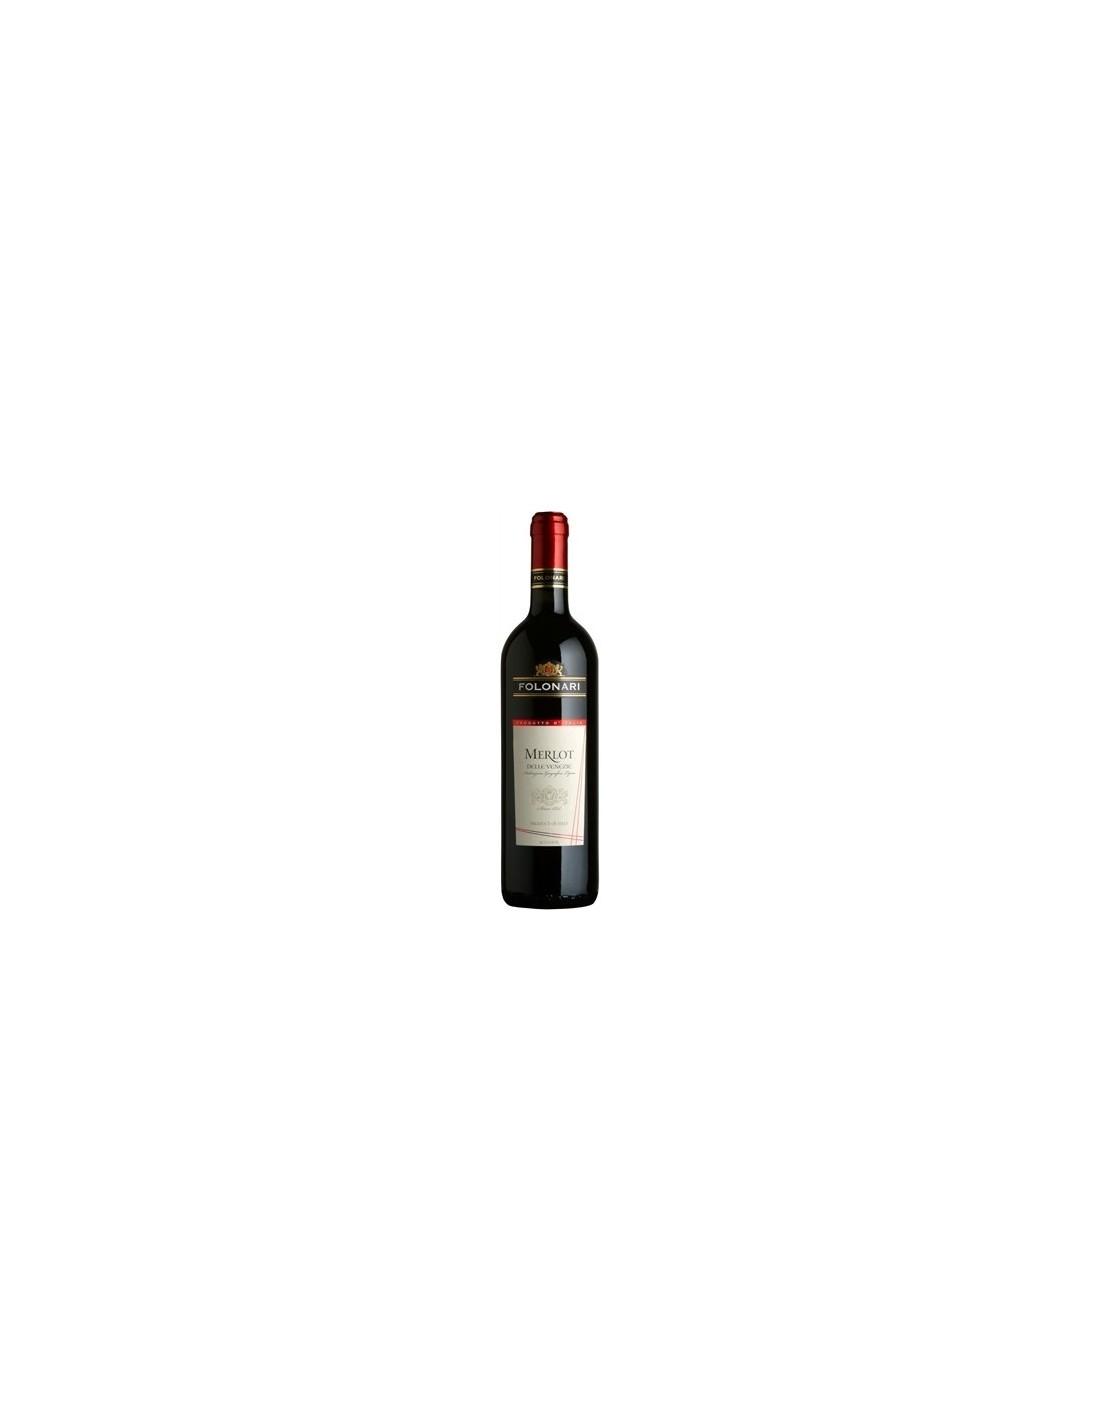 Vin rosu sec, Merlot, Folonari Delle Venezie, 0.75, 12% alc., Italia